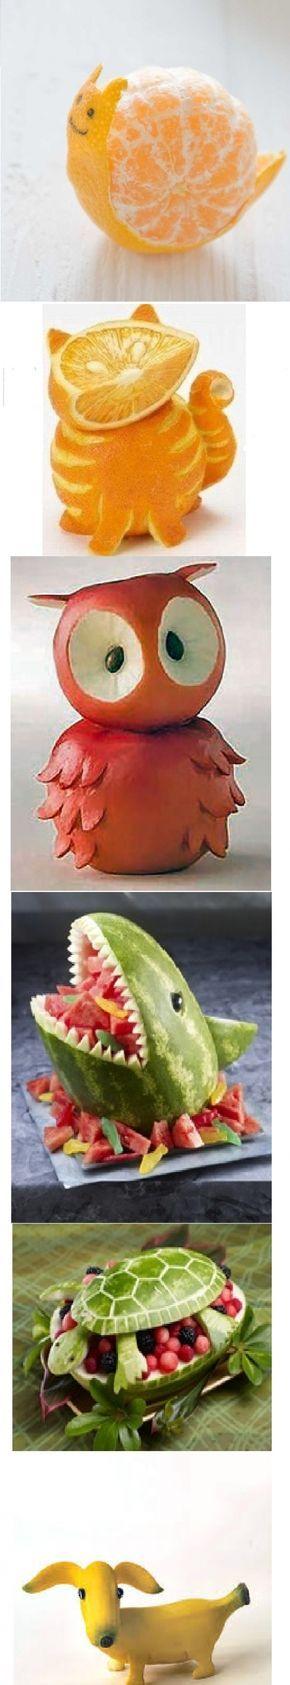 Fun Food Art: Ok the banana dog, orange tabby, and apple owl are figurines, not actual food.